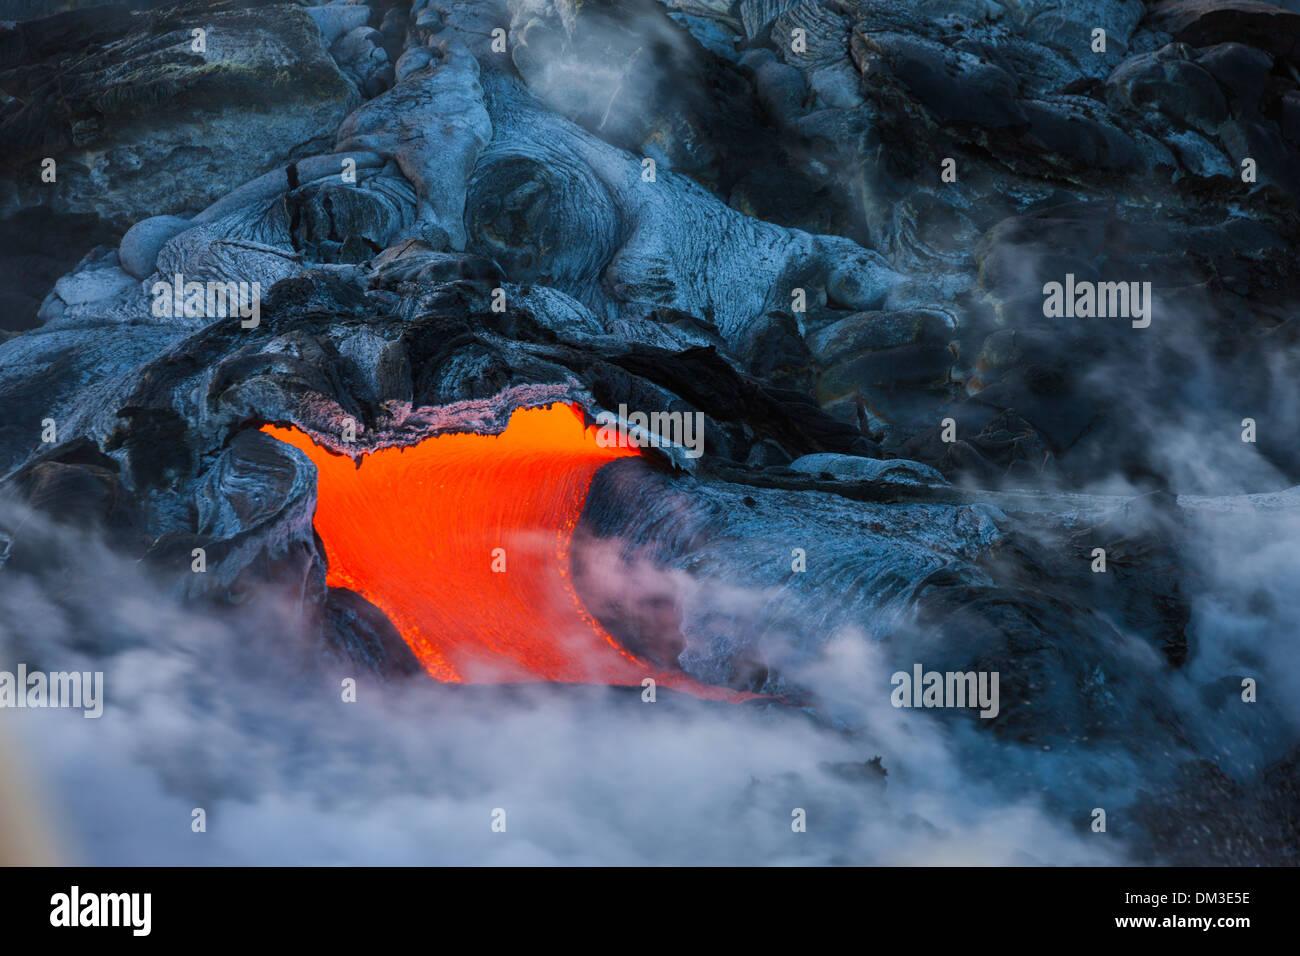 Puu Oo USA United States America Hawaii Big Island Hawaii Volcanoes National Park volcano lava sea Pacific coast steam fire - Stock Image